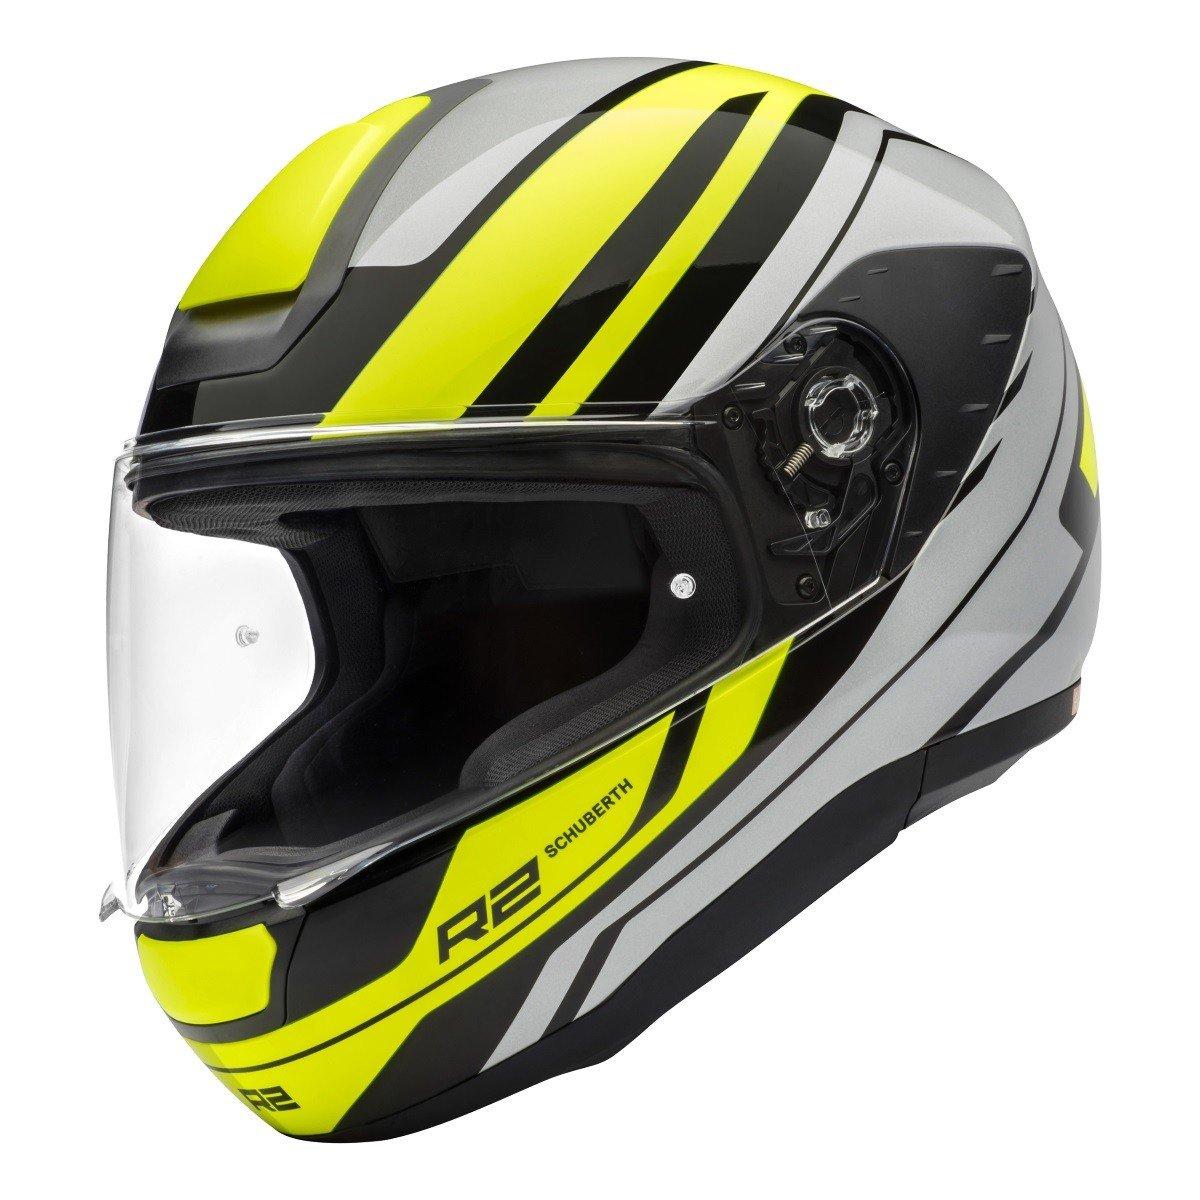 Schuberth R2 Enforcer yellow M (56/57)